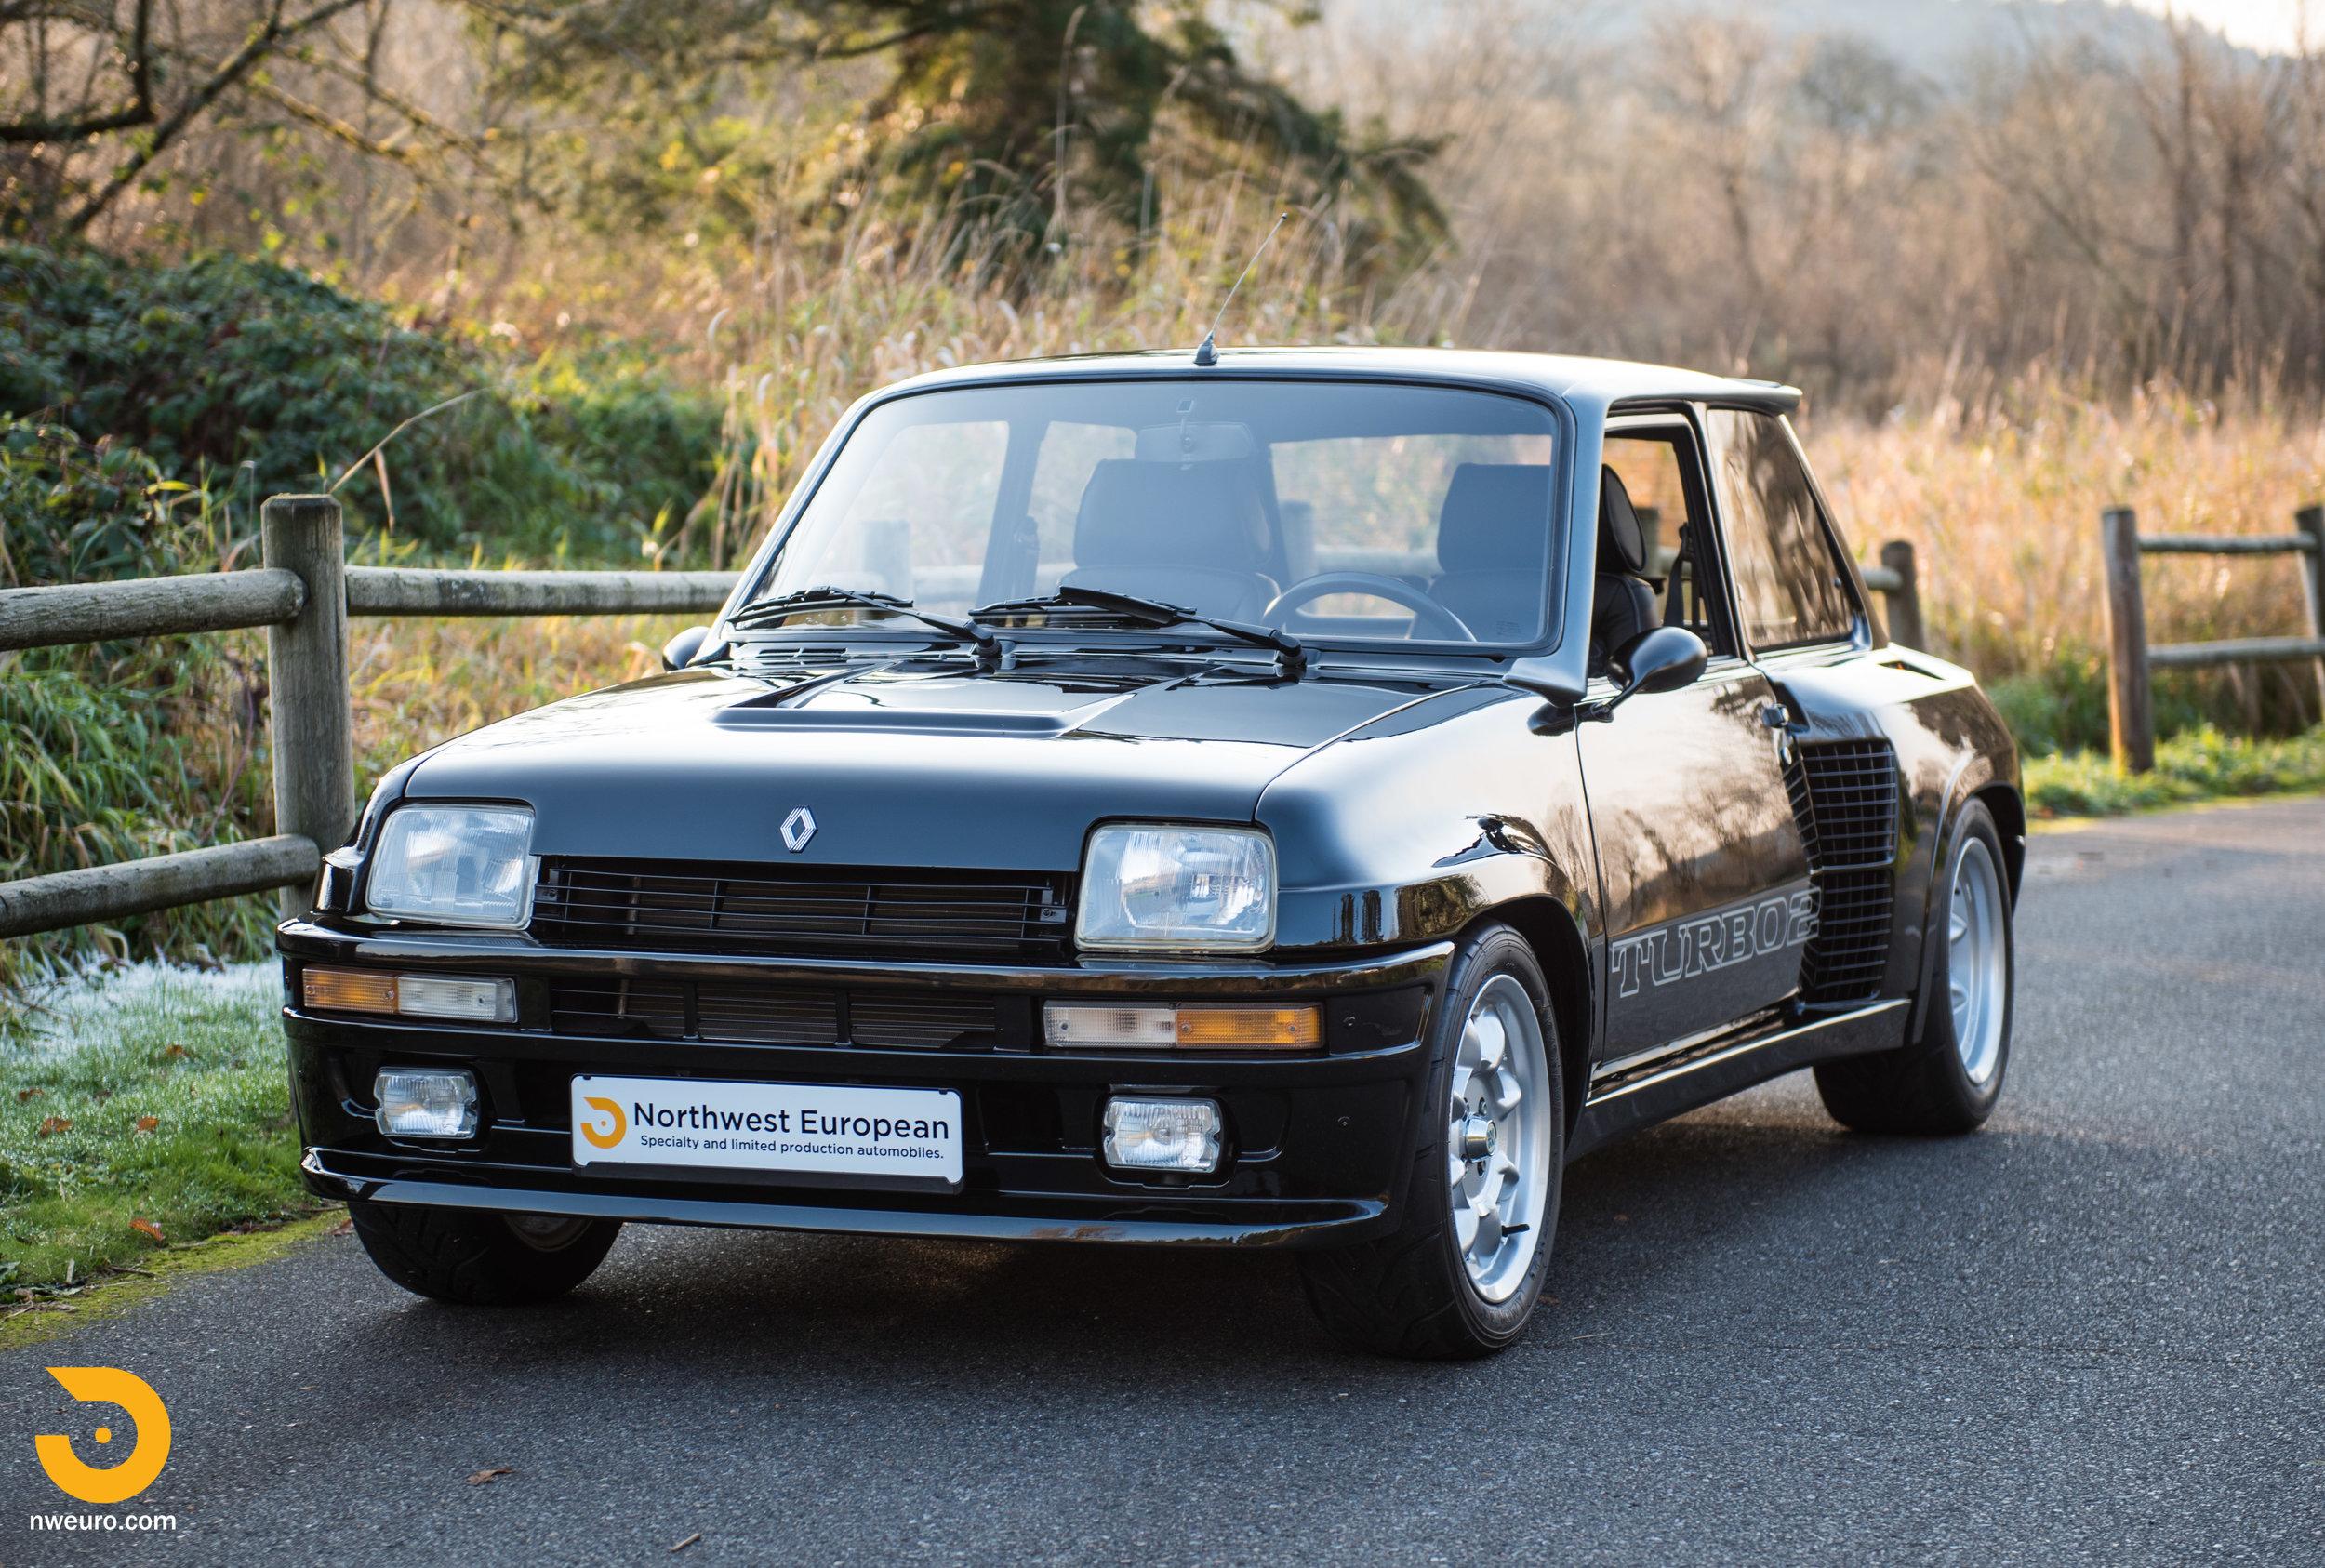 1983 Renault R5 Turbo 2 Black at Park-9.jpg